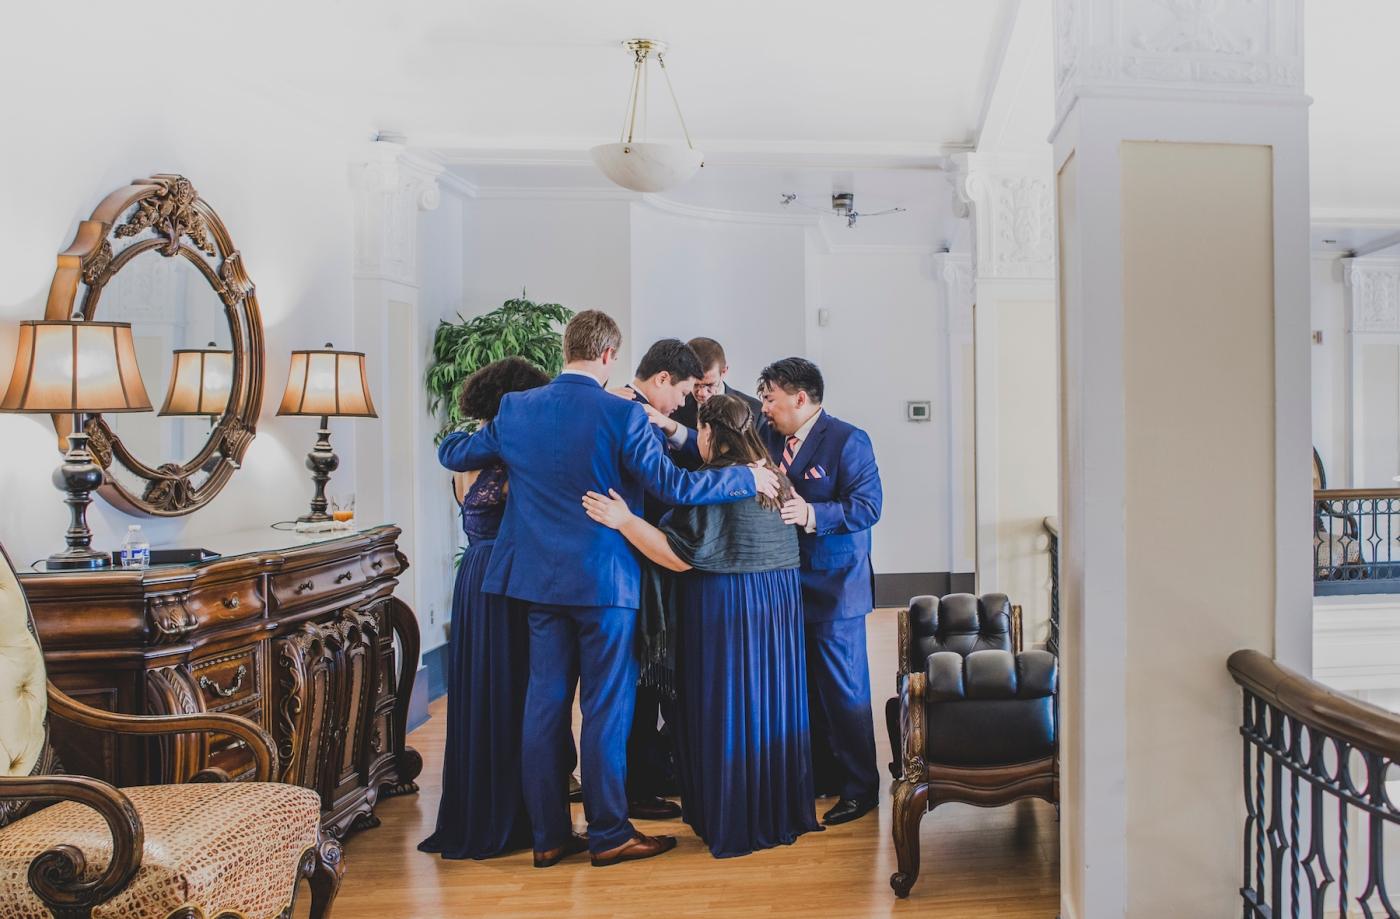 DSC_2401Everett_Wedding_Ballroom_Jane_Speleers_photography_Rachel_and_Edmund_Praying_2017